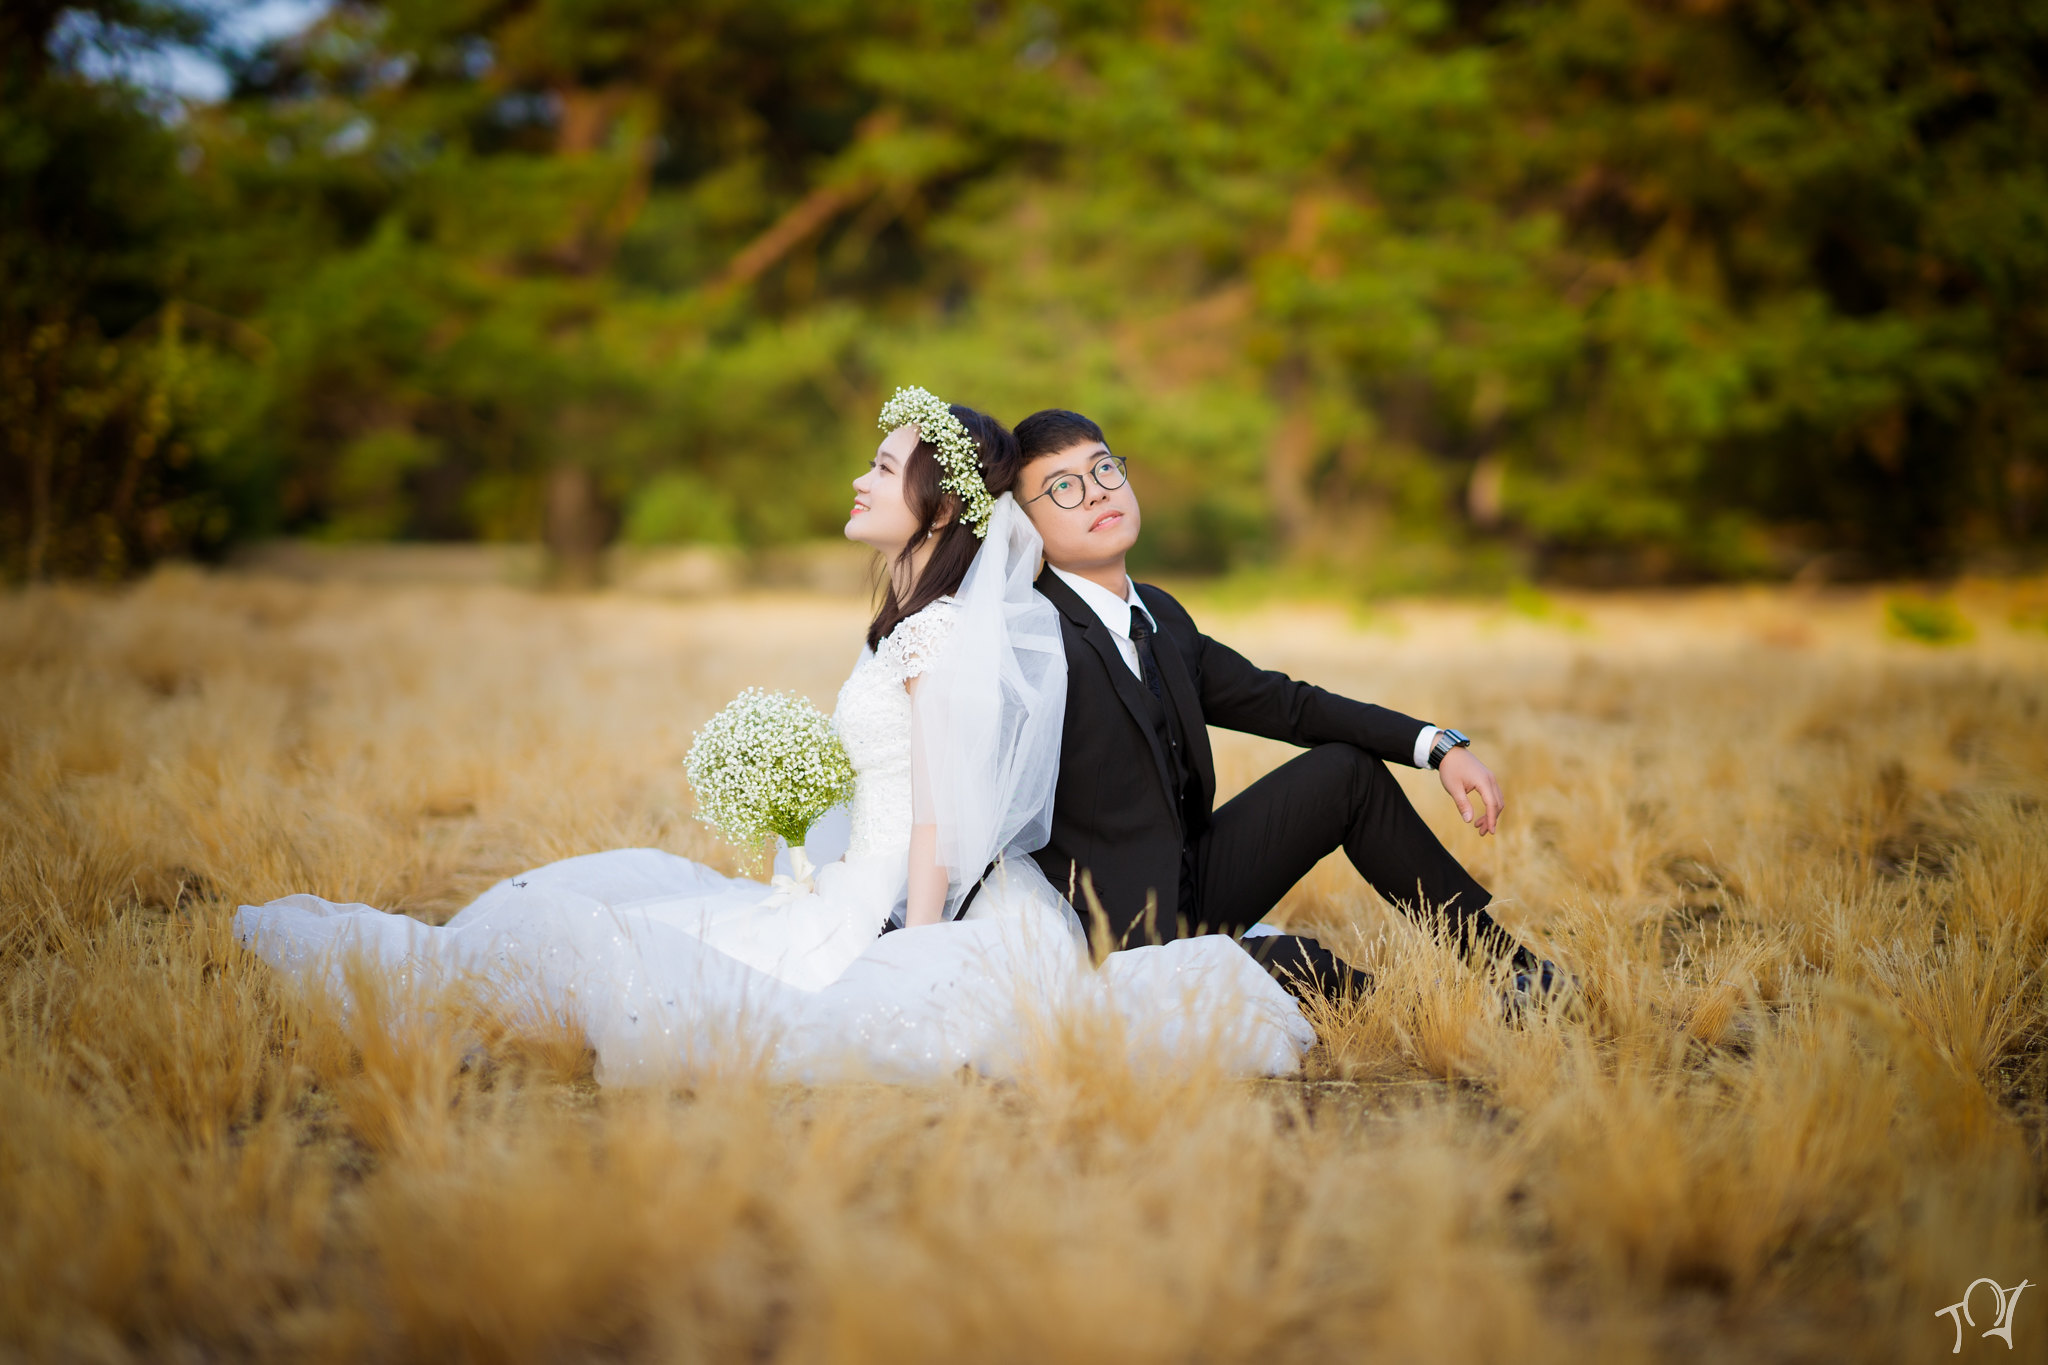 Nhi & Viet | Prewedding